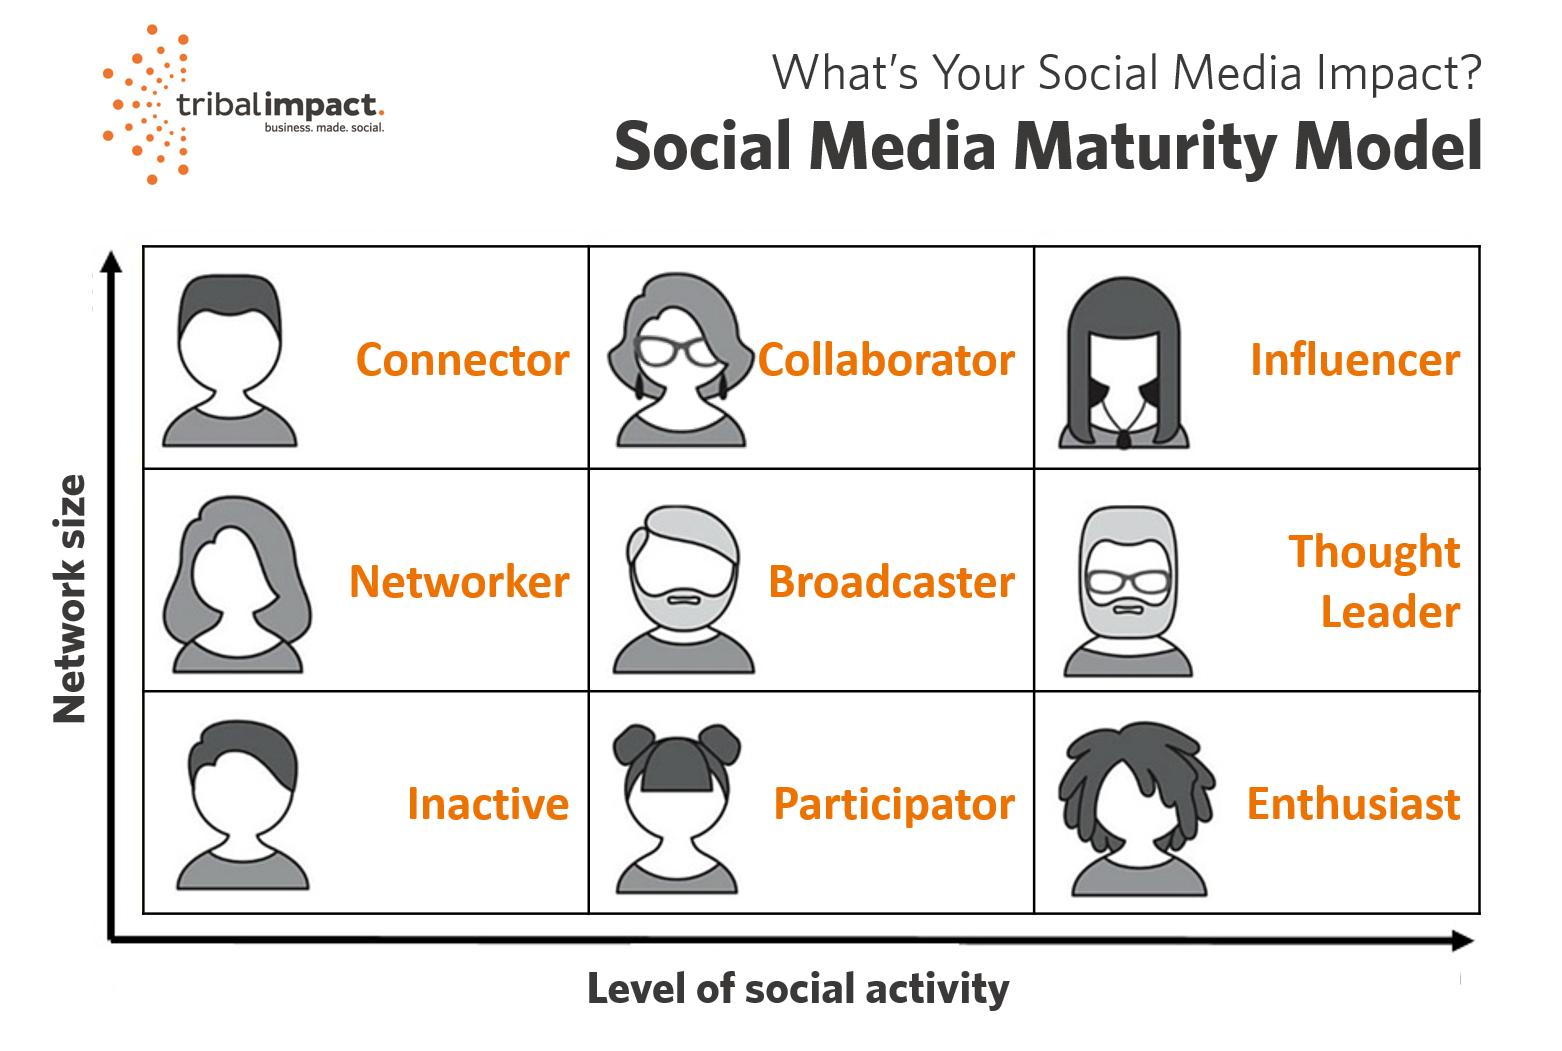 What's Your Social Media Impact? [Quiz]